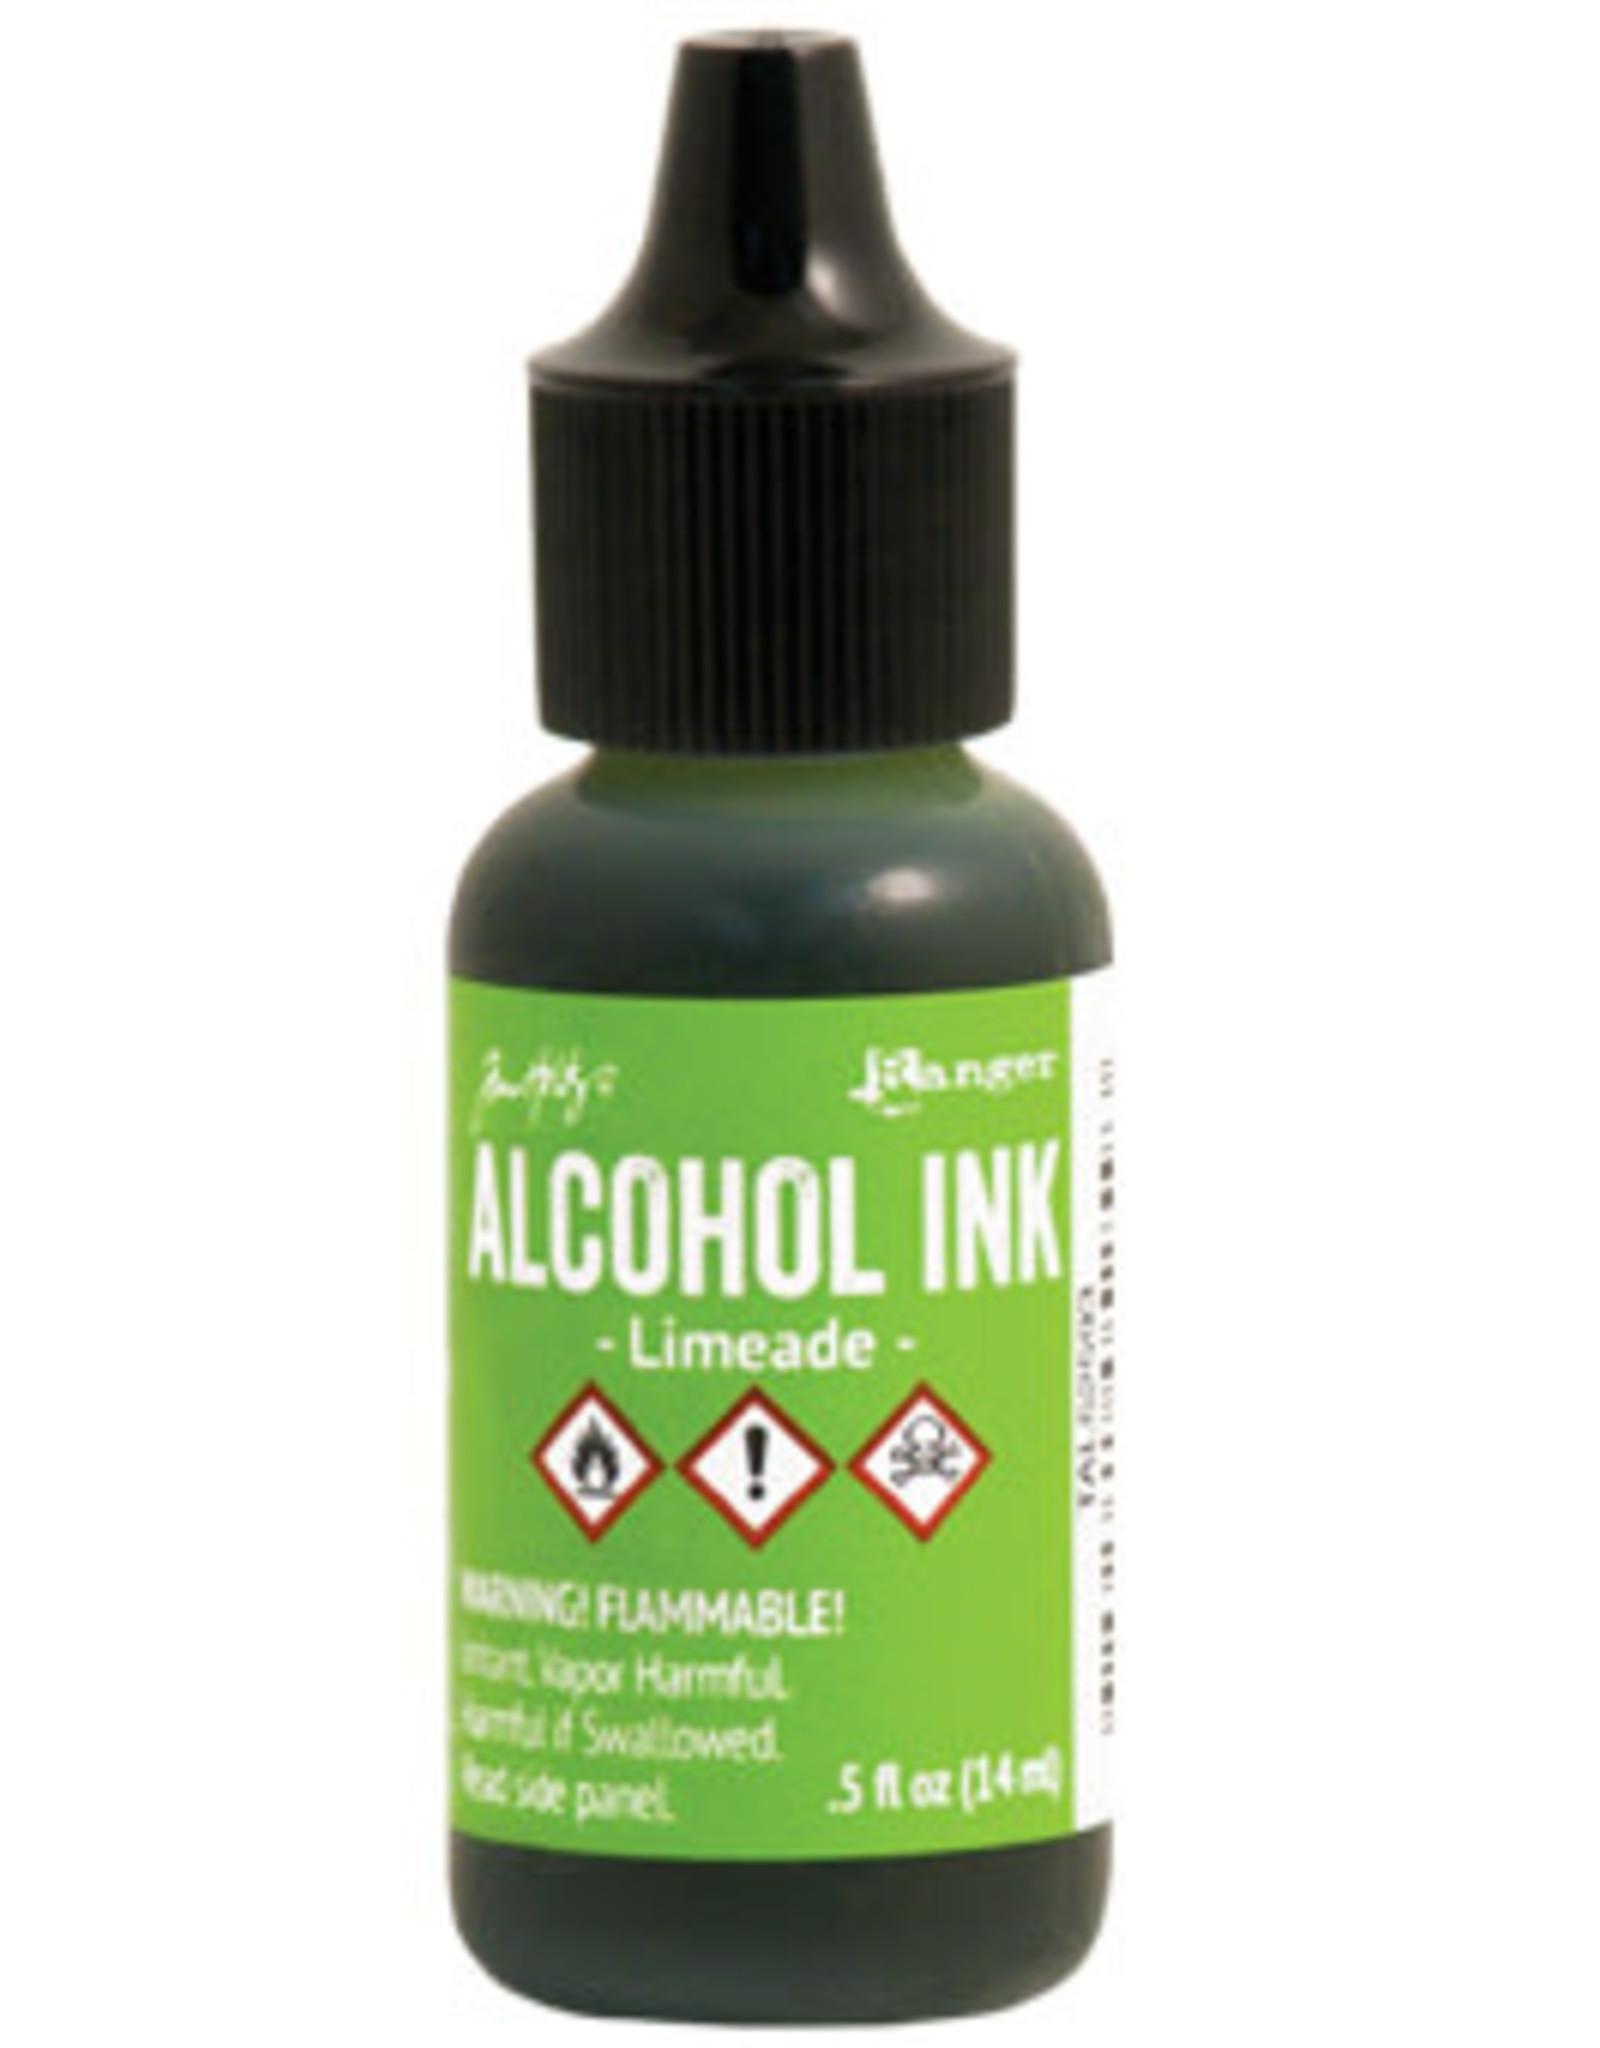 Tim Holtz Alcohol Ink 1/2 oz Limeade